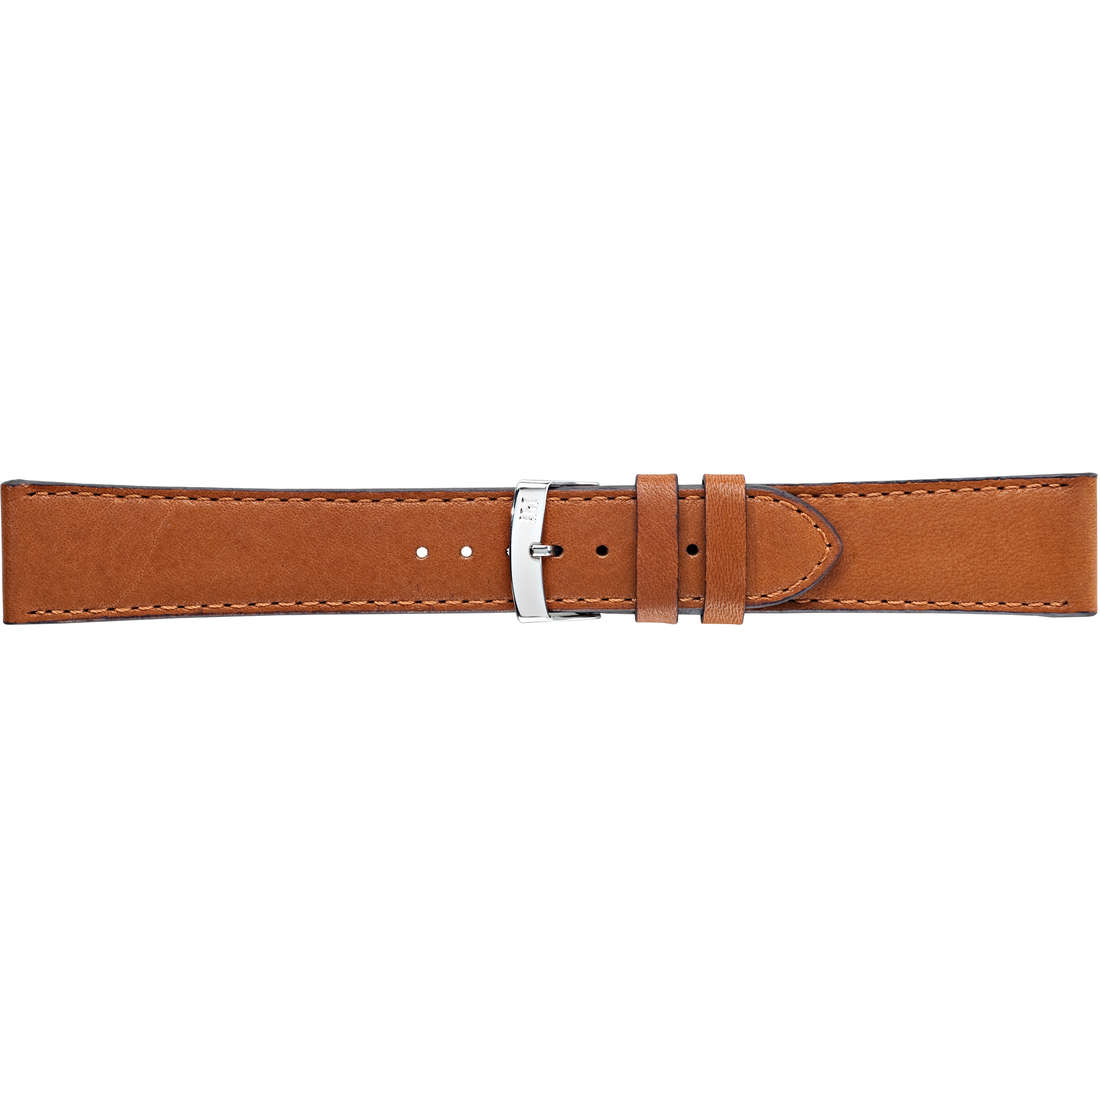 watch watch bands watch straps man Morellato Performance A01X3688A37042CR18